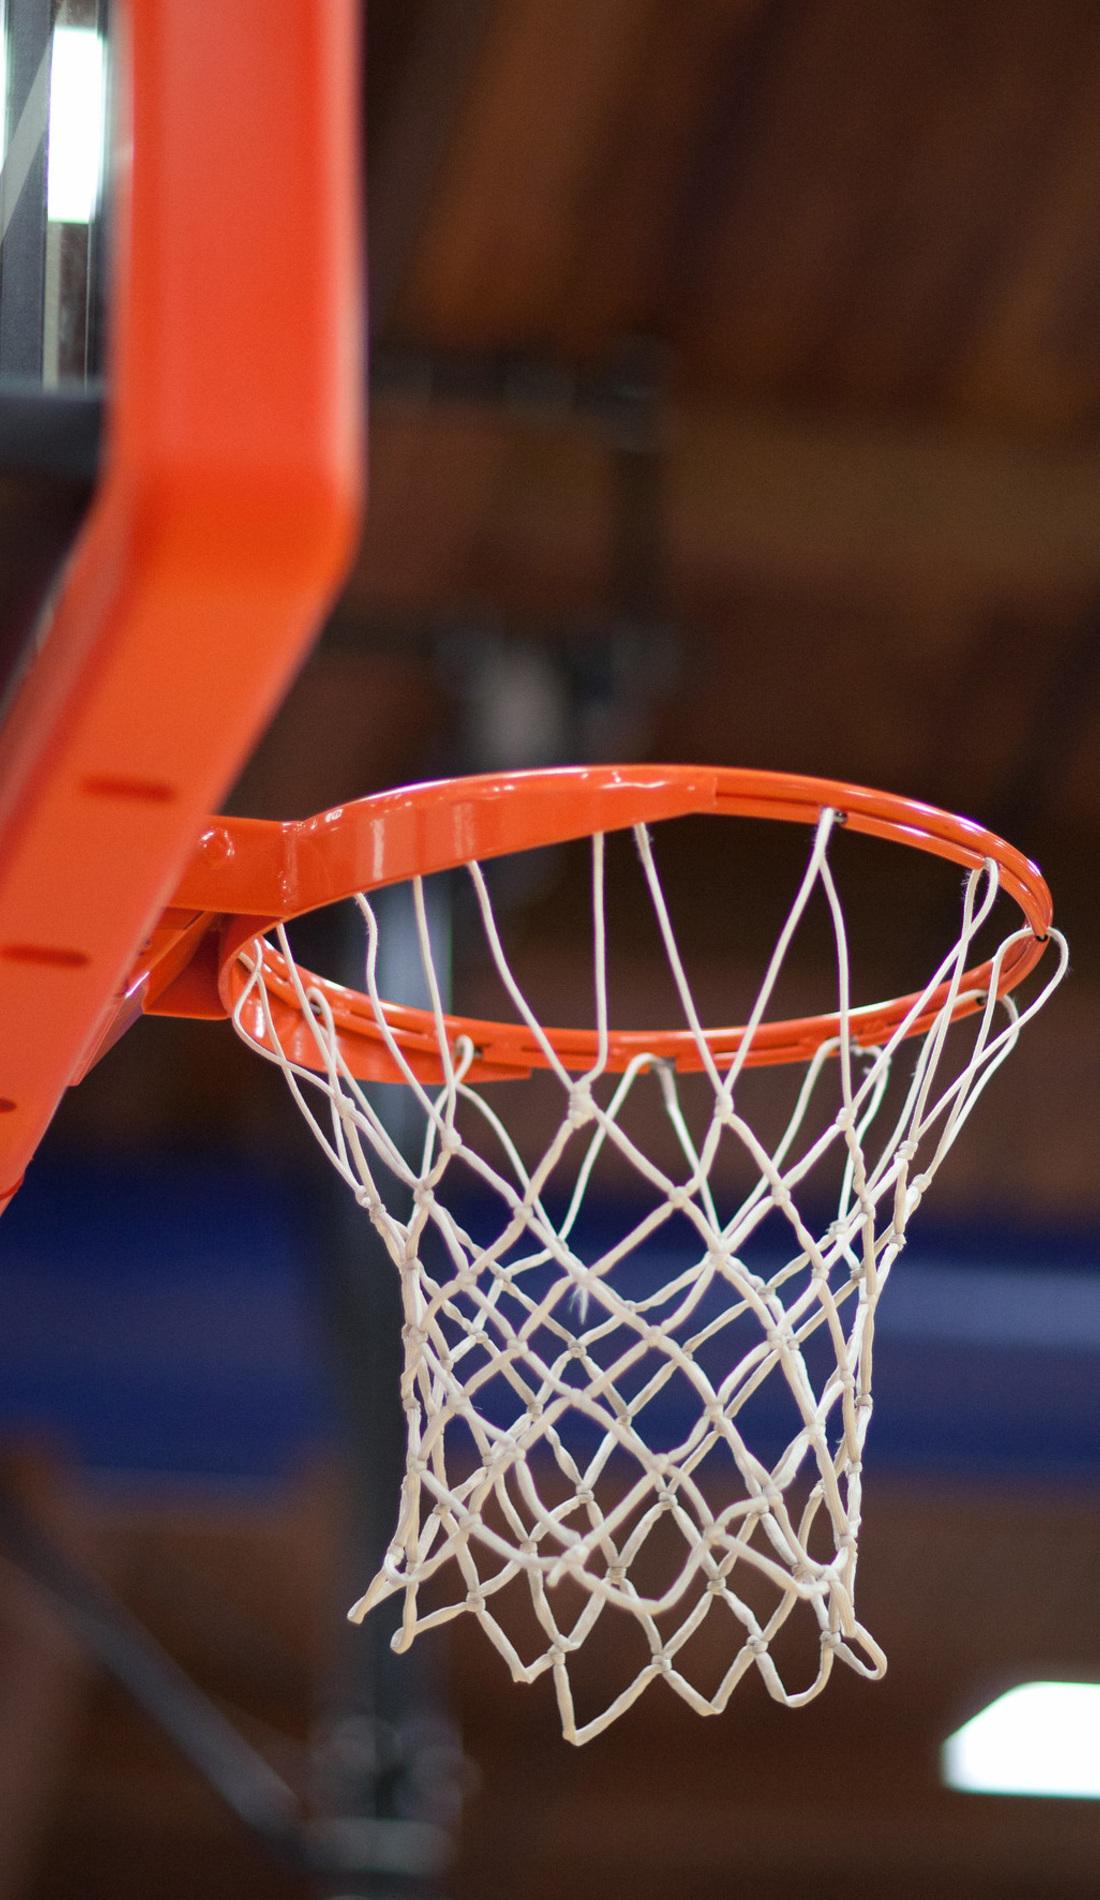 A Florida State Seminoles Basketball live event